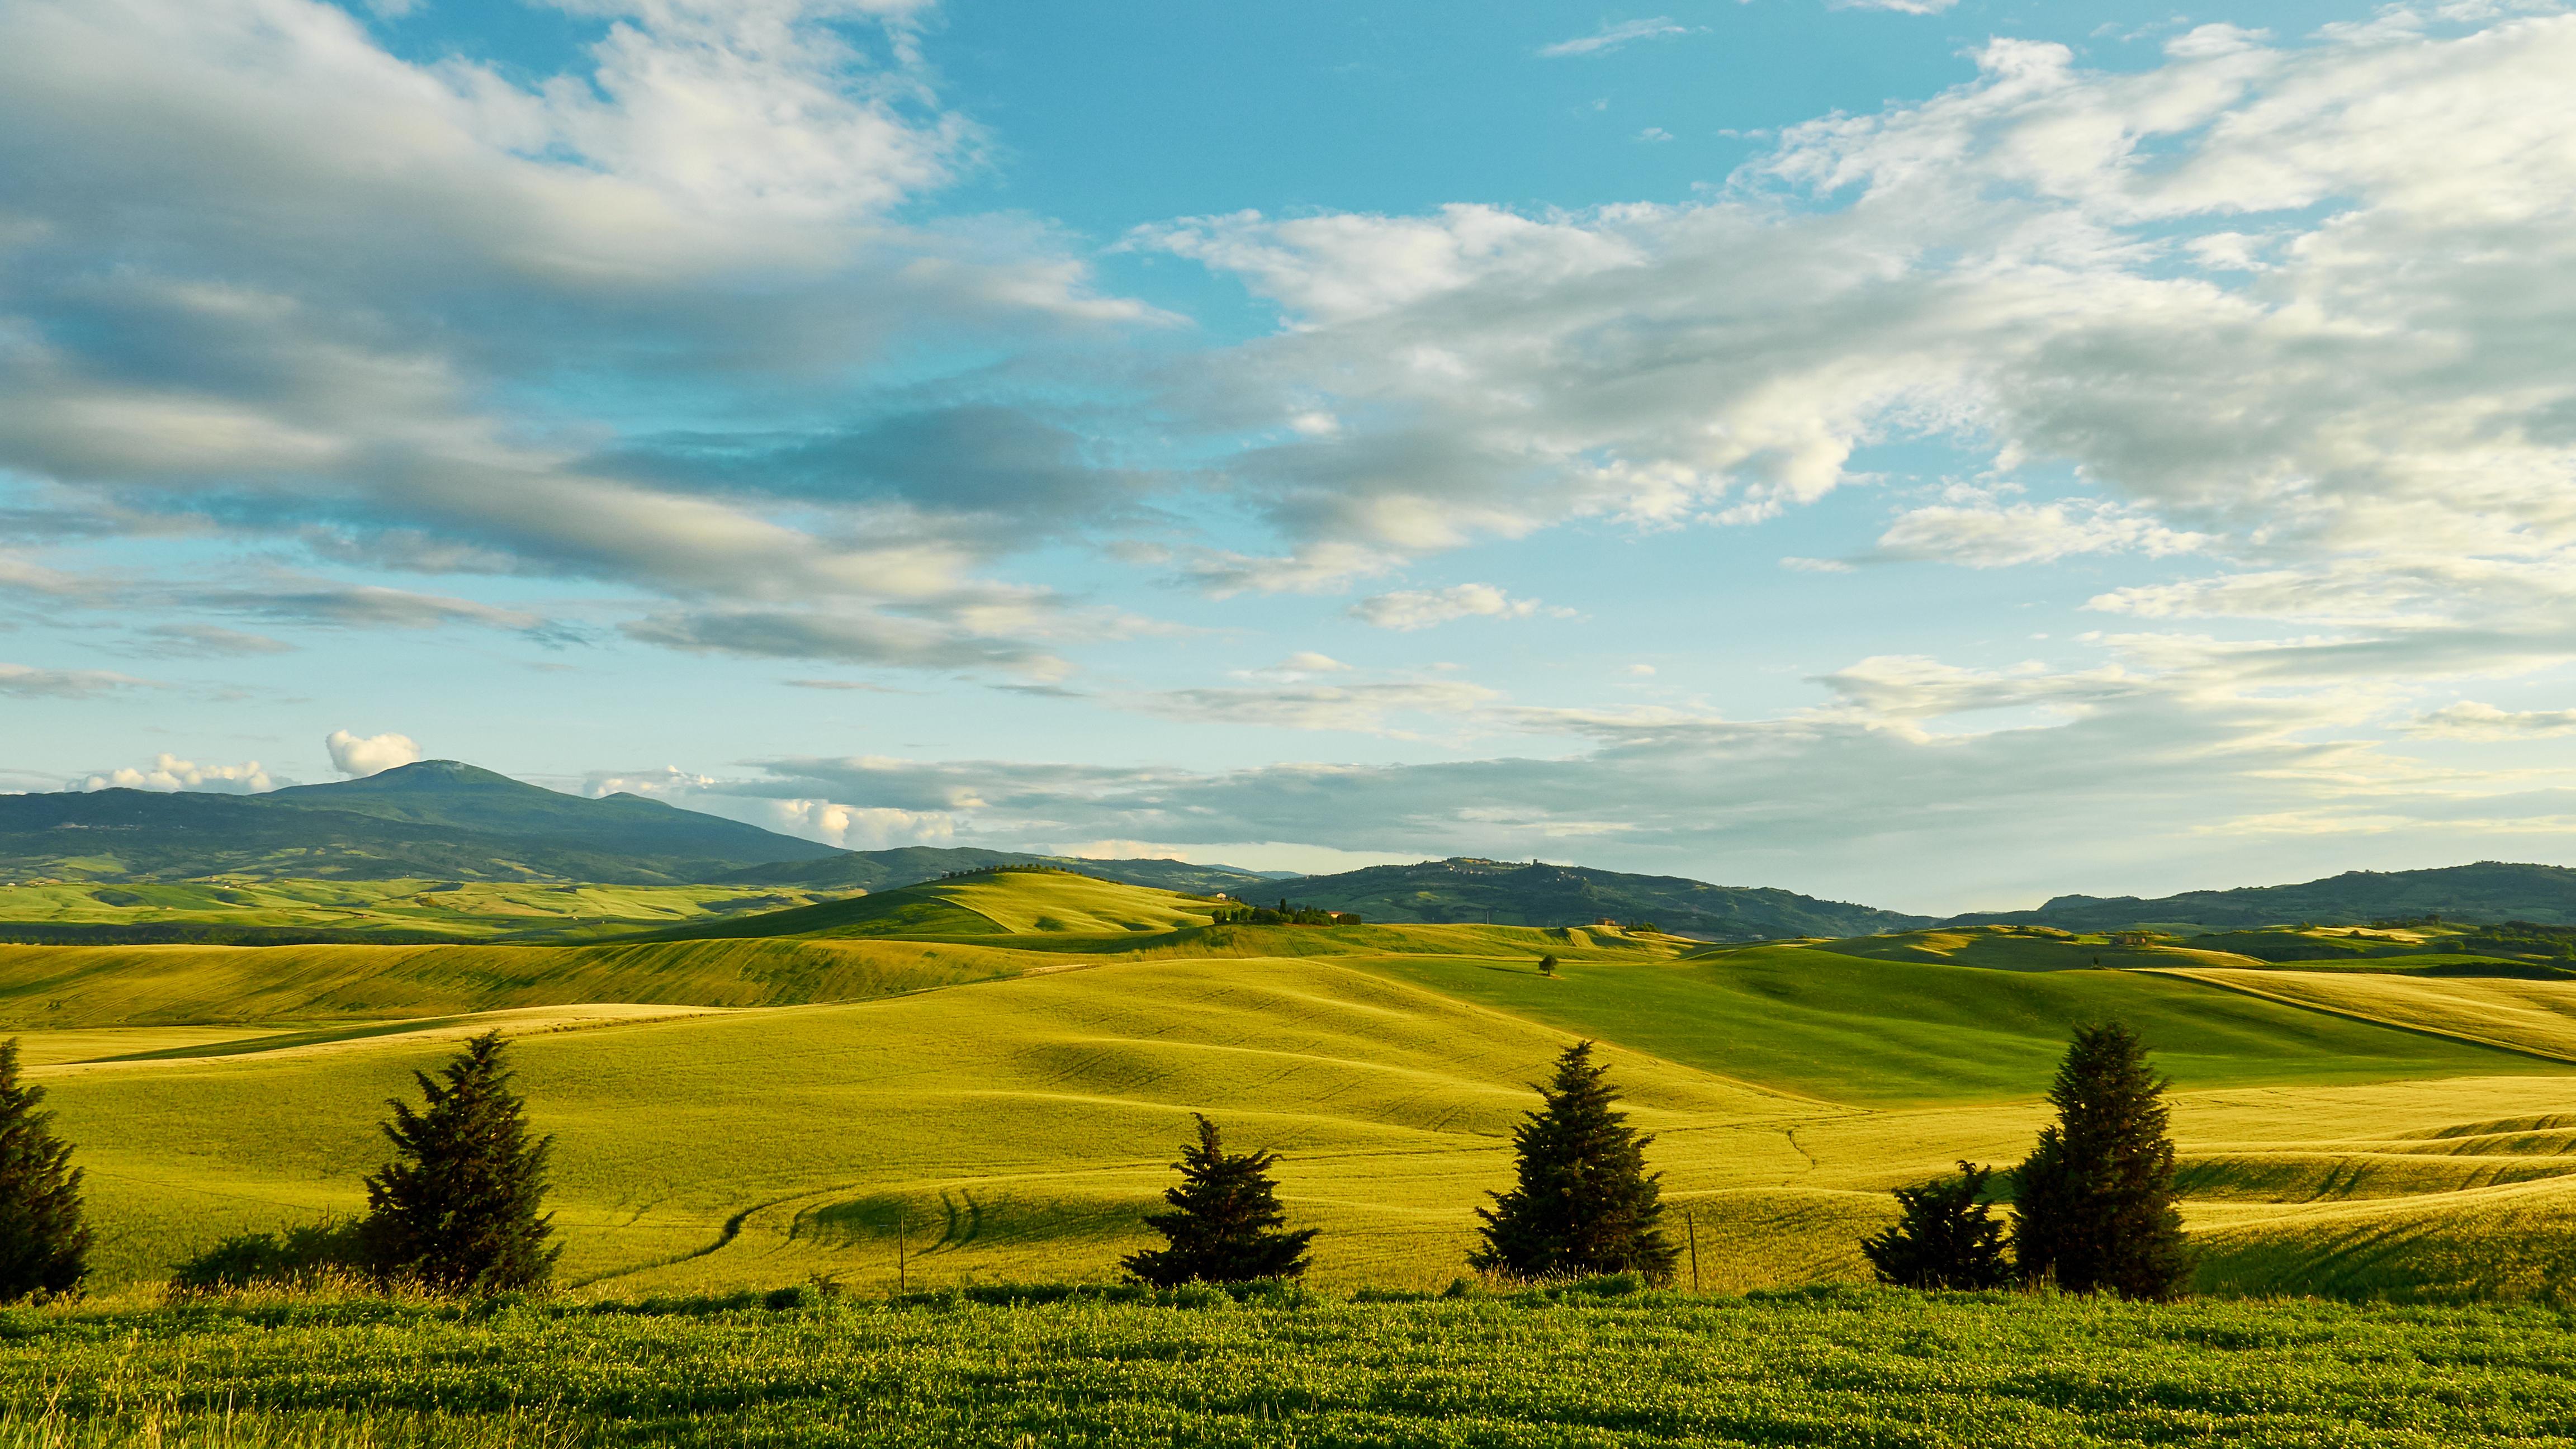 природа поле холм облака небо трава nature field hill clouds the sky grass без смс